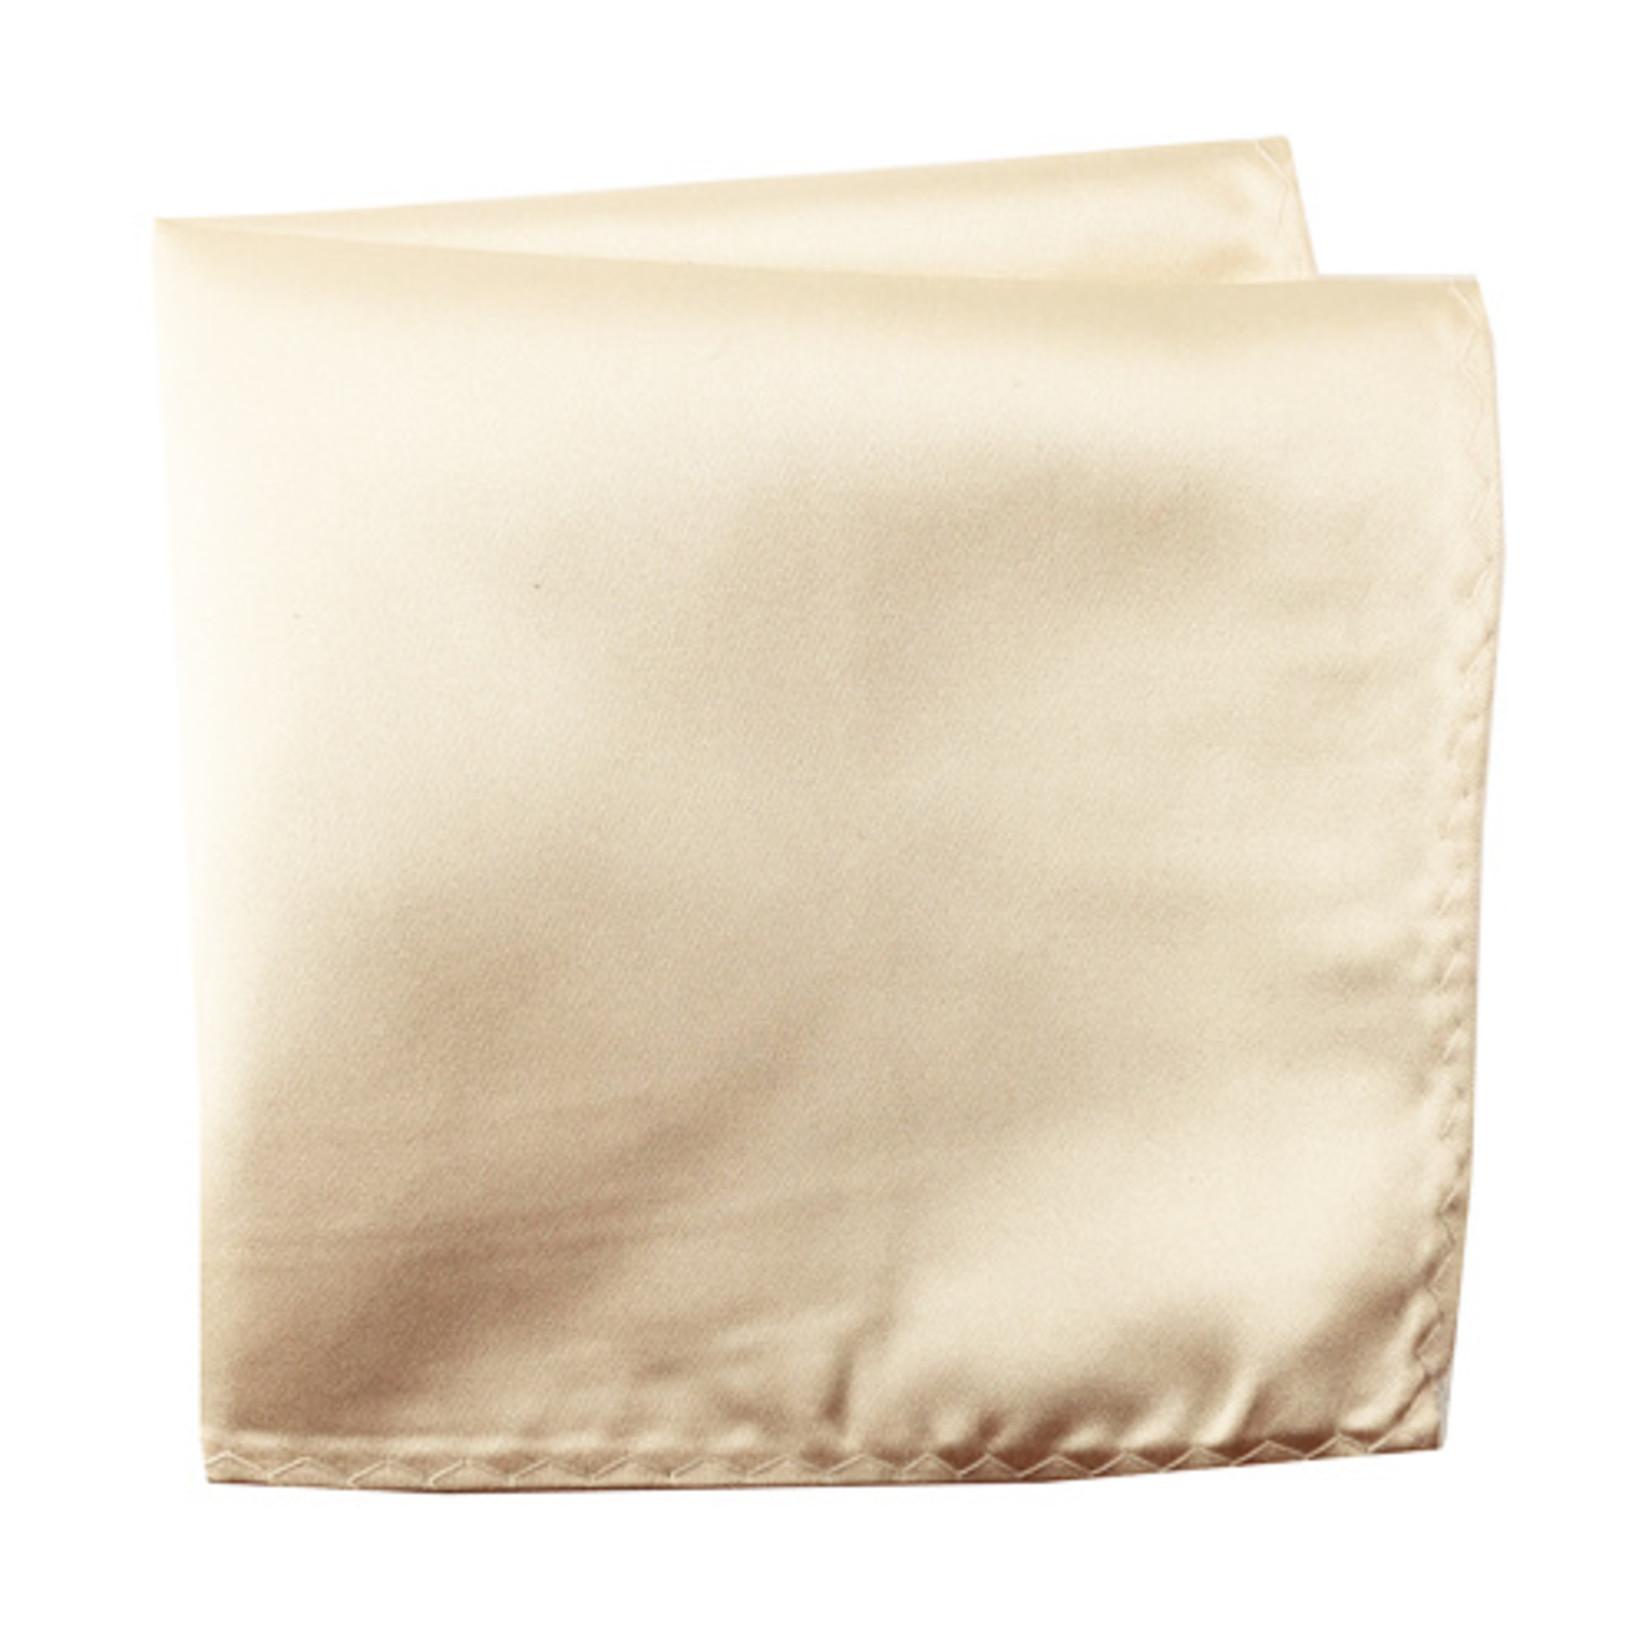 Knotz M100PSQ-33 Solid Ecru Pocket Square